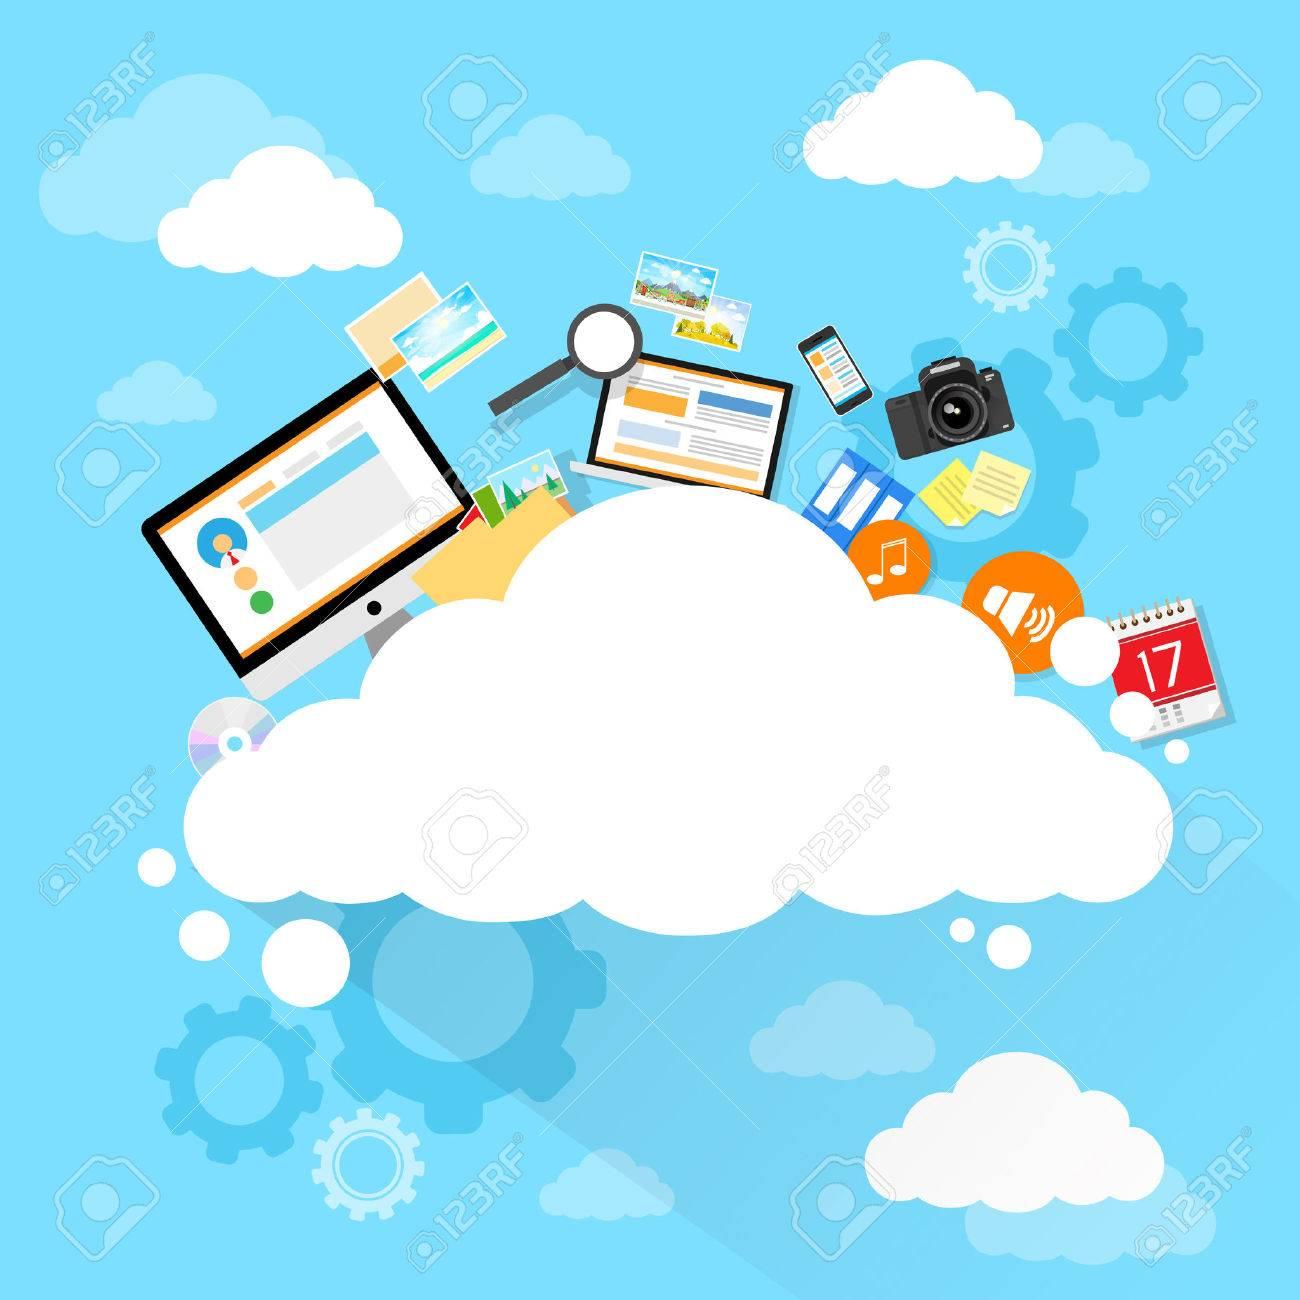 Cloud computing technology device set internet data information storage - 37887421